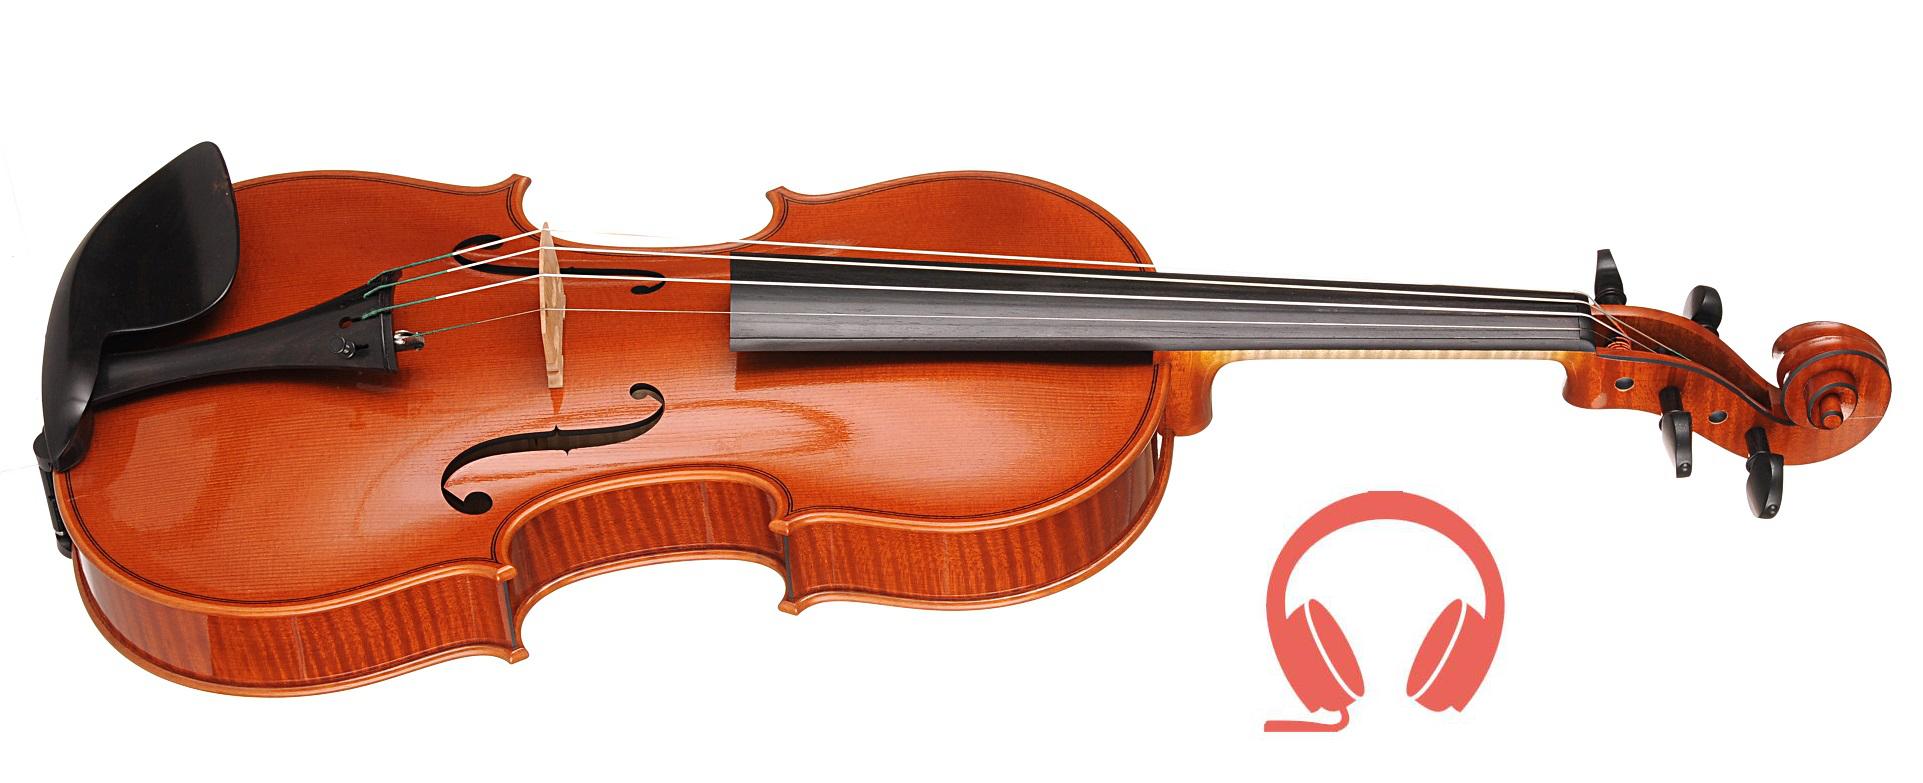 Debora Scianamé (Italy) - Finalist, violin No Hero | binaural audio recording, chamber hall | 13th International H. Wieniawski Violin Making Competition (2016)